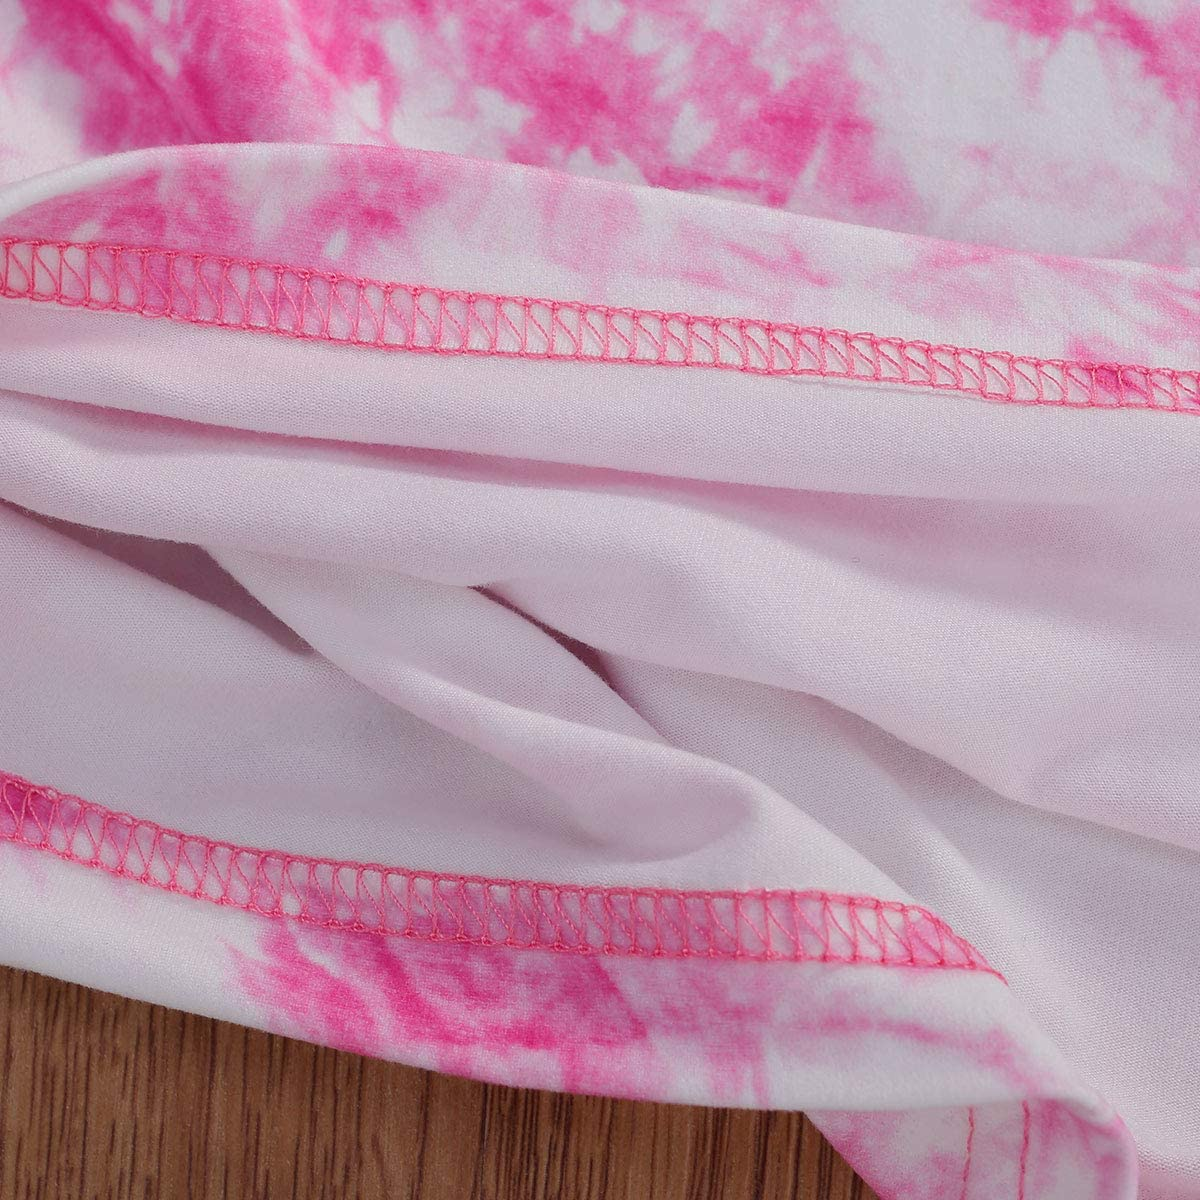 Toddler Baby Girl Boy Clothes Tie Dye Pajama Sleepwear Long Sleeve T-Shirt Tops Pants Outfit Set 2PCS Lounge